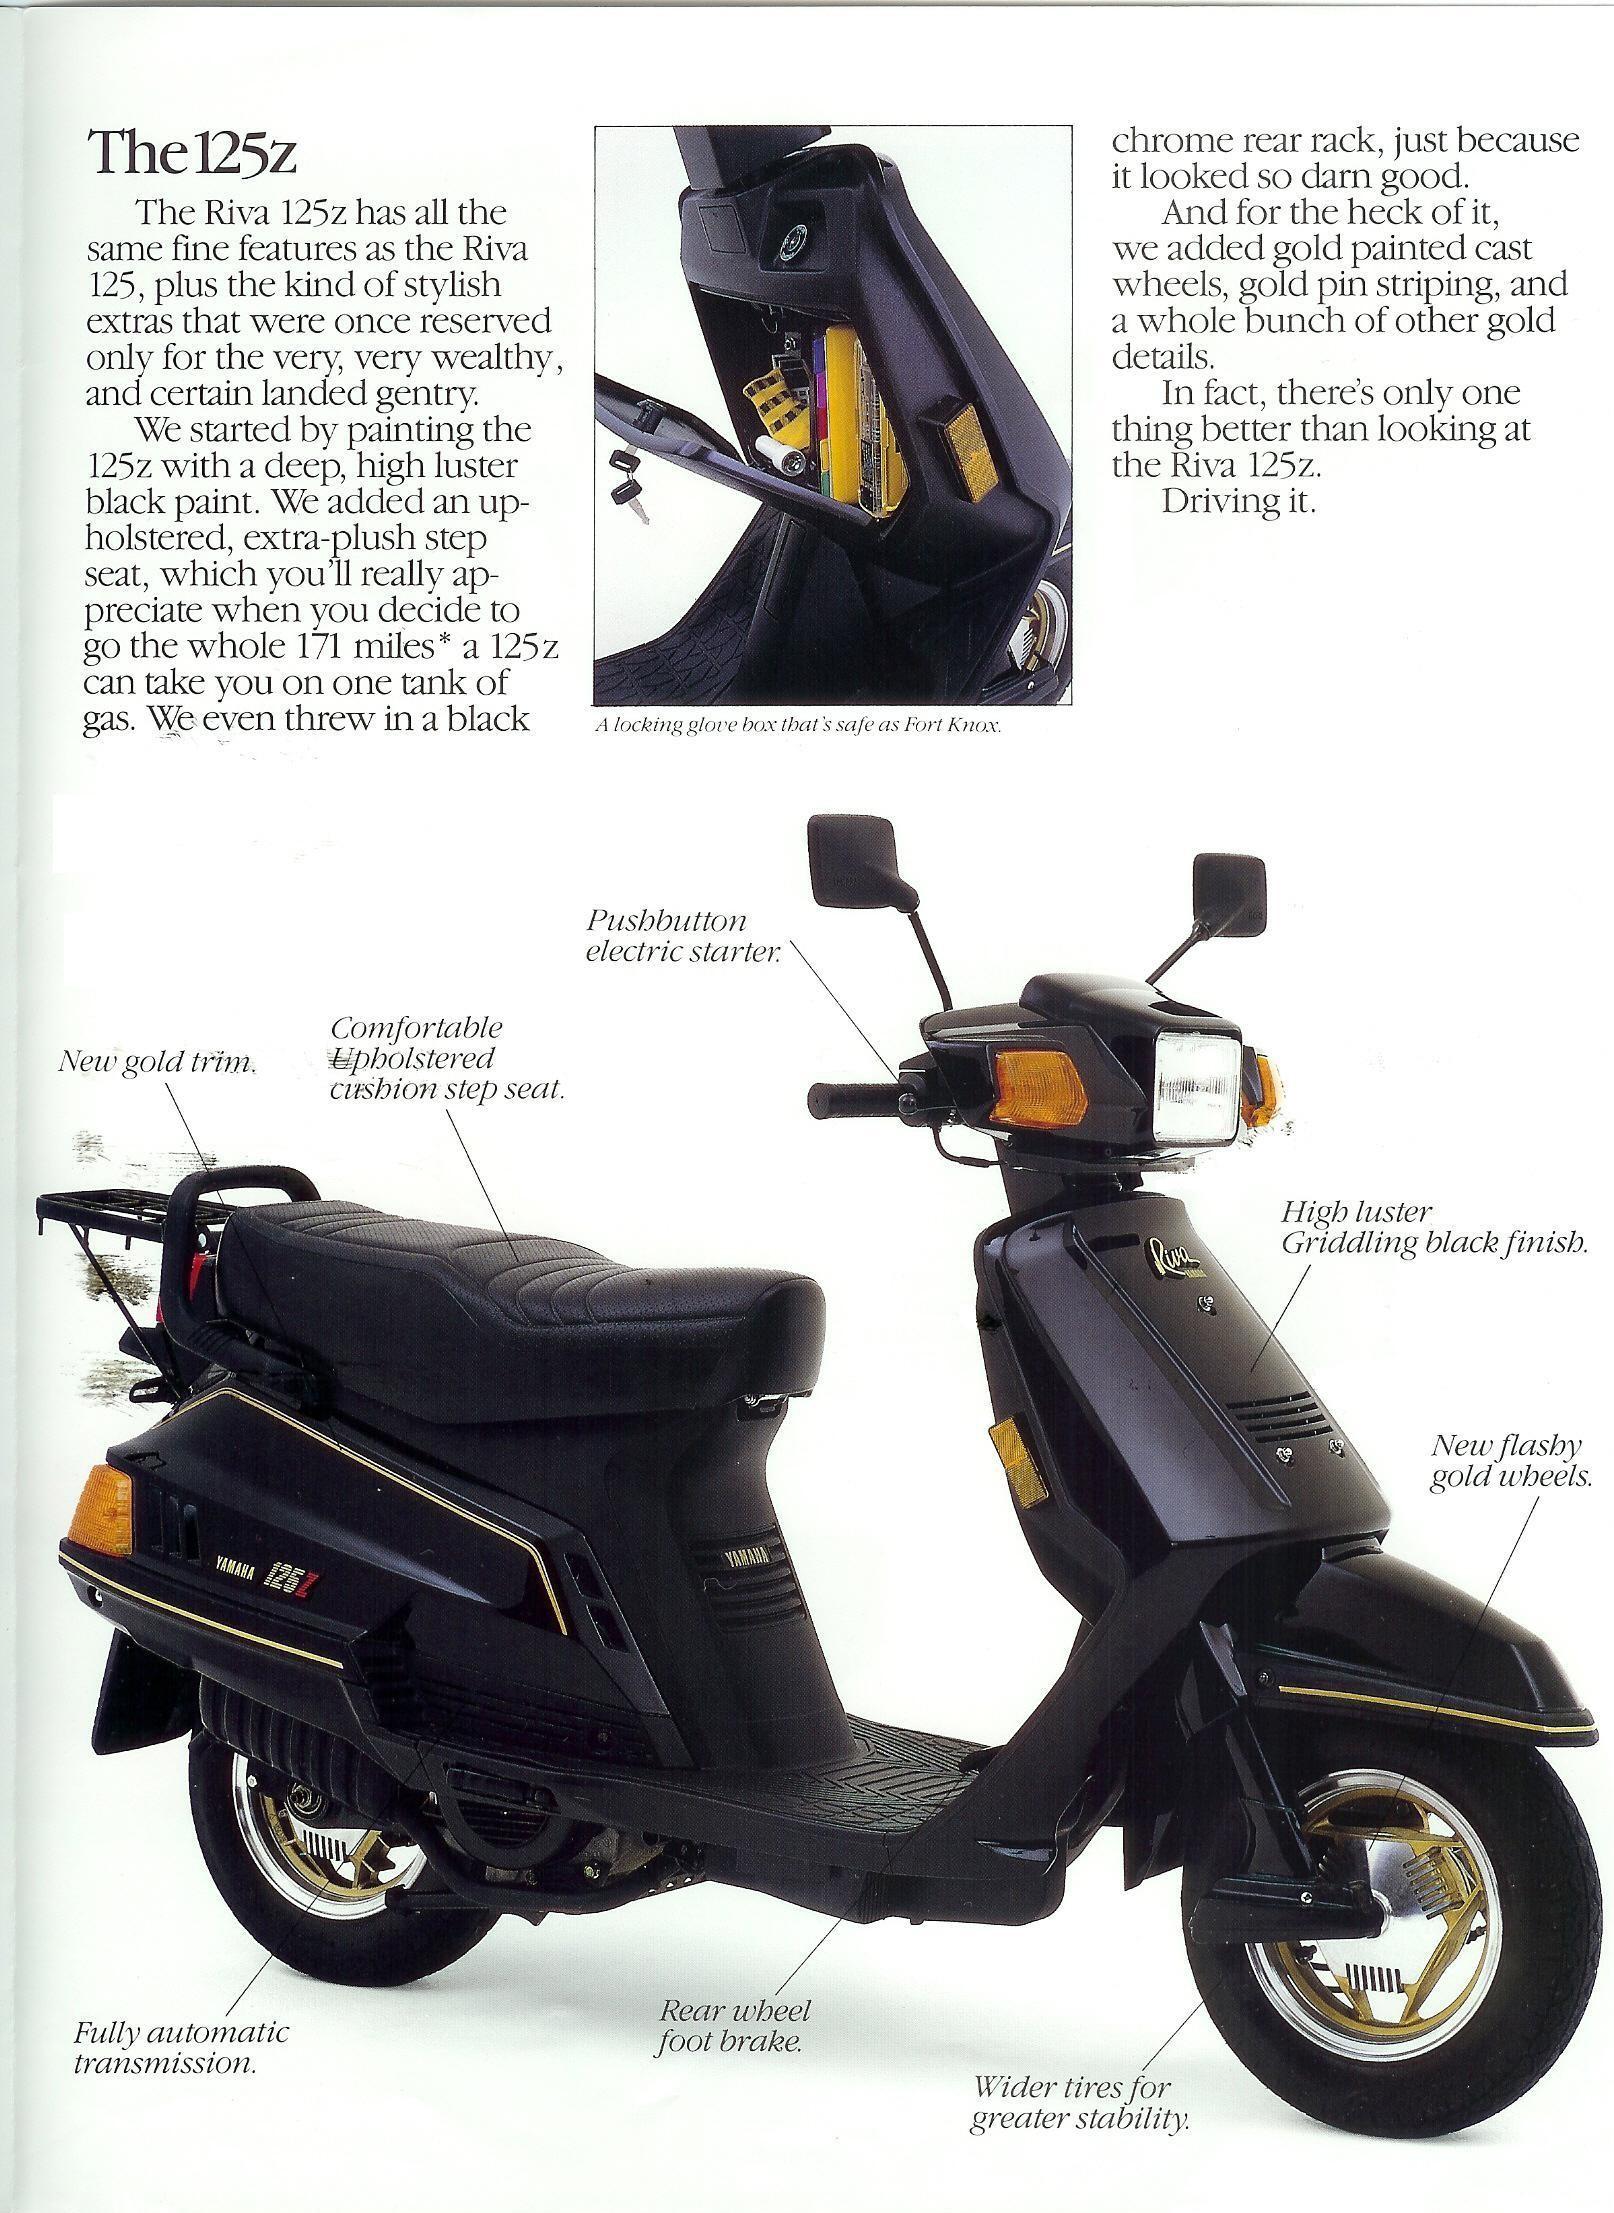 Yamaha 125z Engine Diagram General Yamaha Scooter Information Of Yamaha 125z Engine Diagram